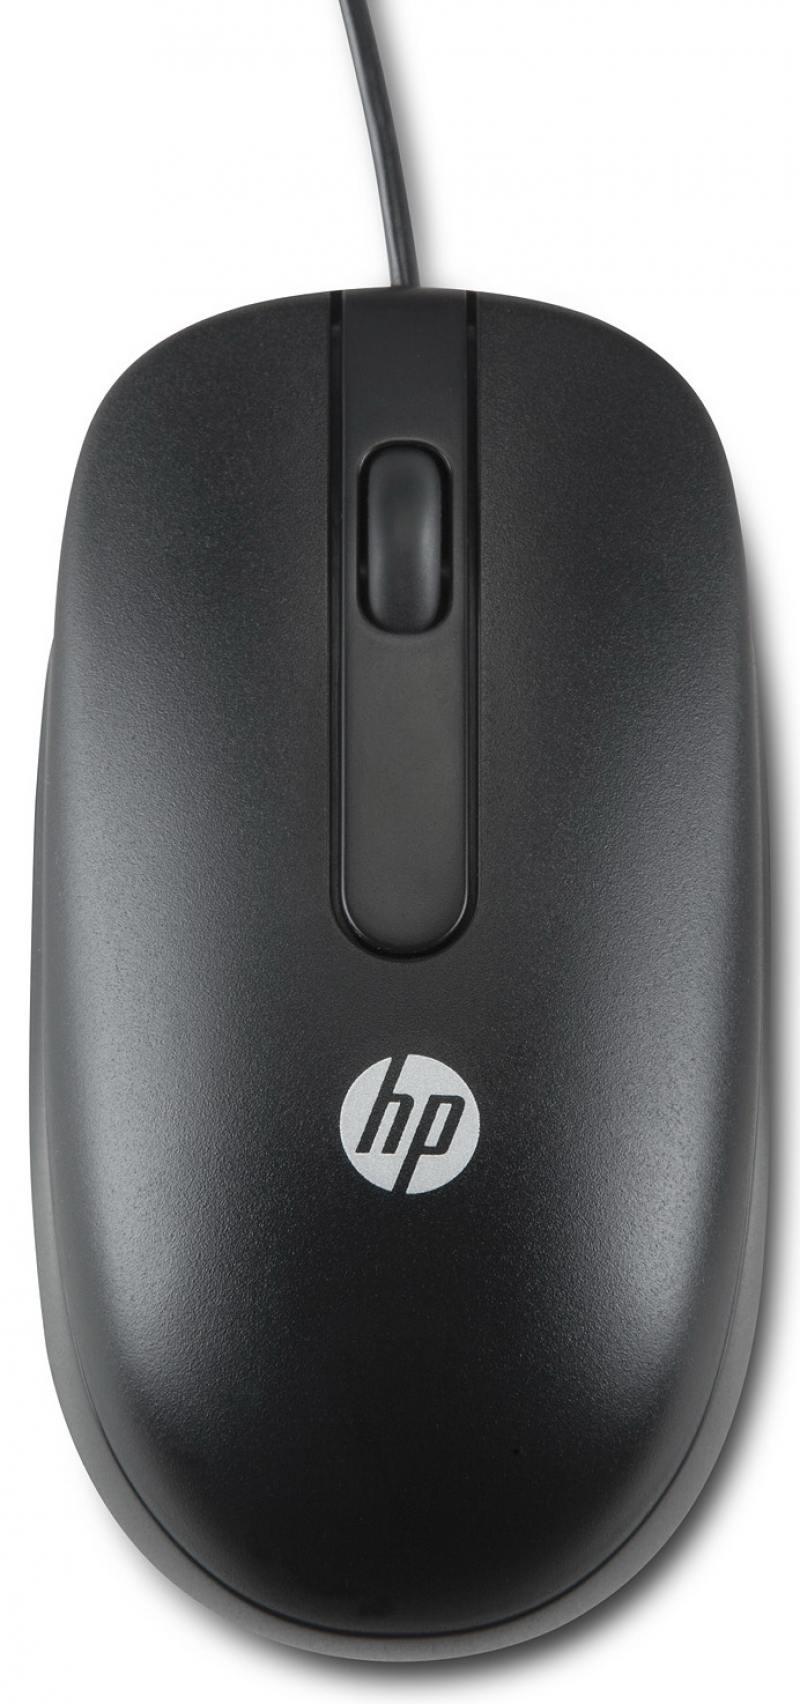 Мышь Gembird MUSOPTI8-809U USB черн./красн soft touch 2400dpi,4 кнопки + колесо-кнопка